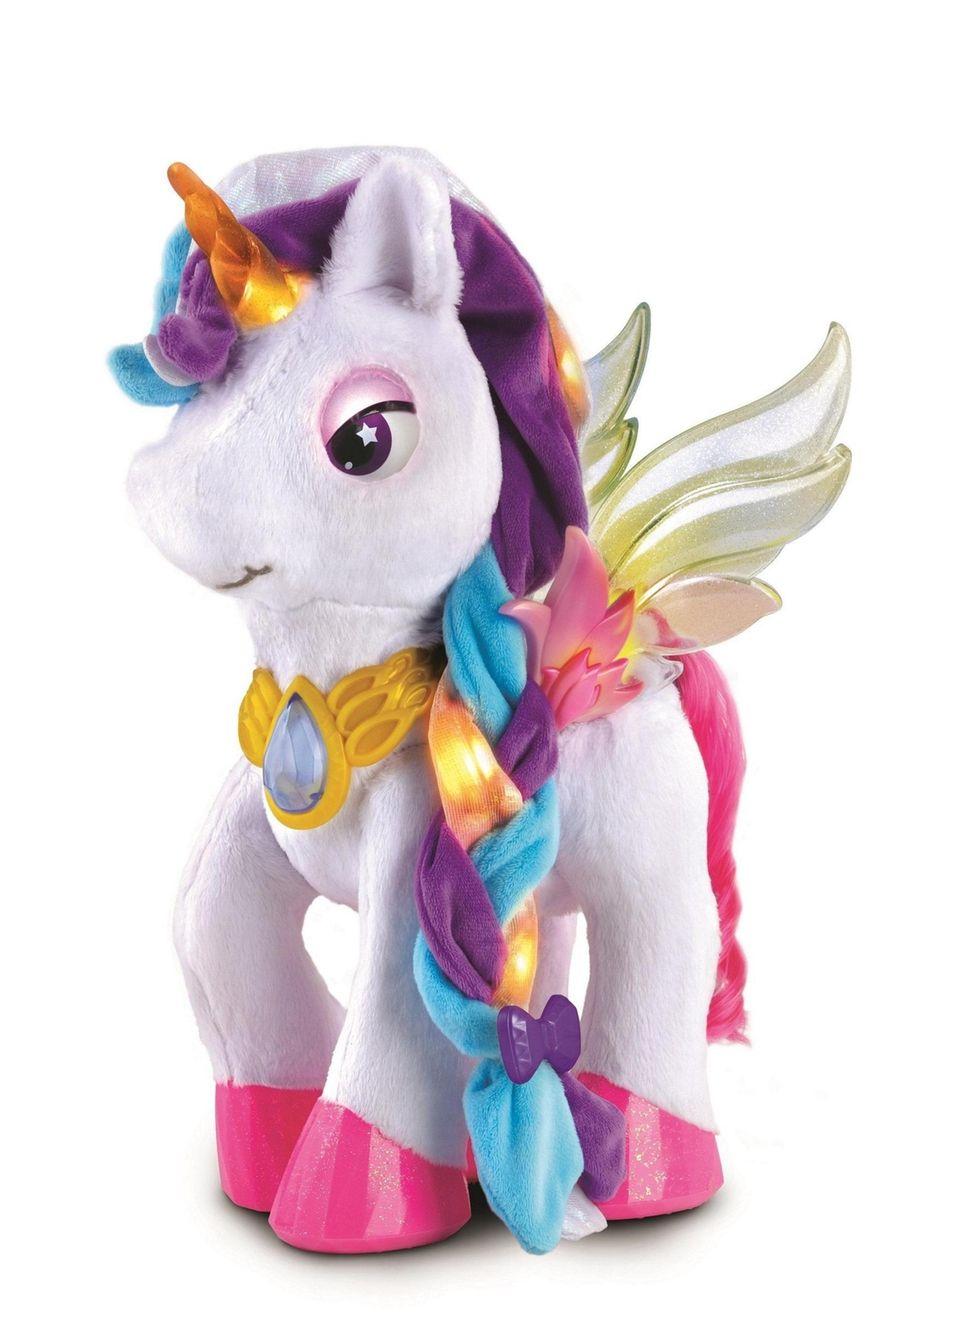 Myla, a robotic unicorn, glitters with lights when